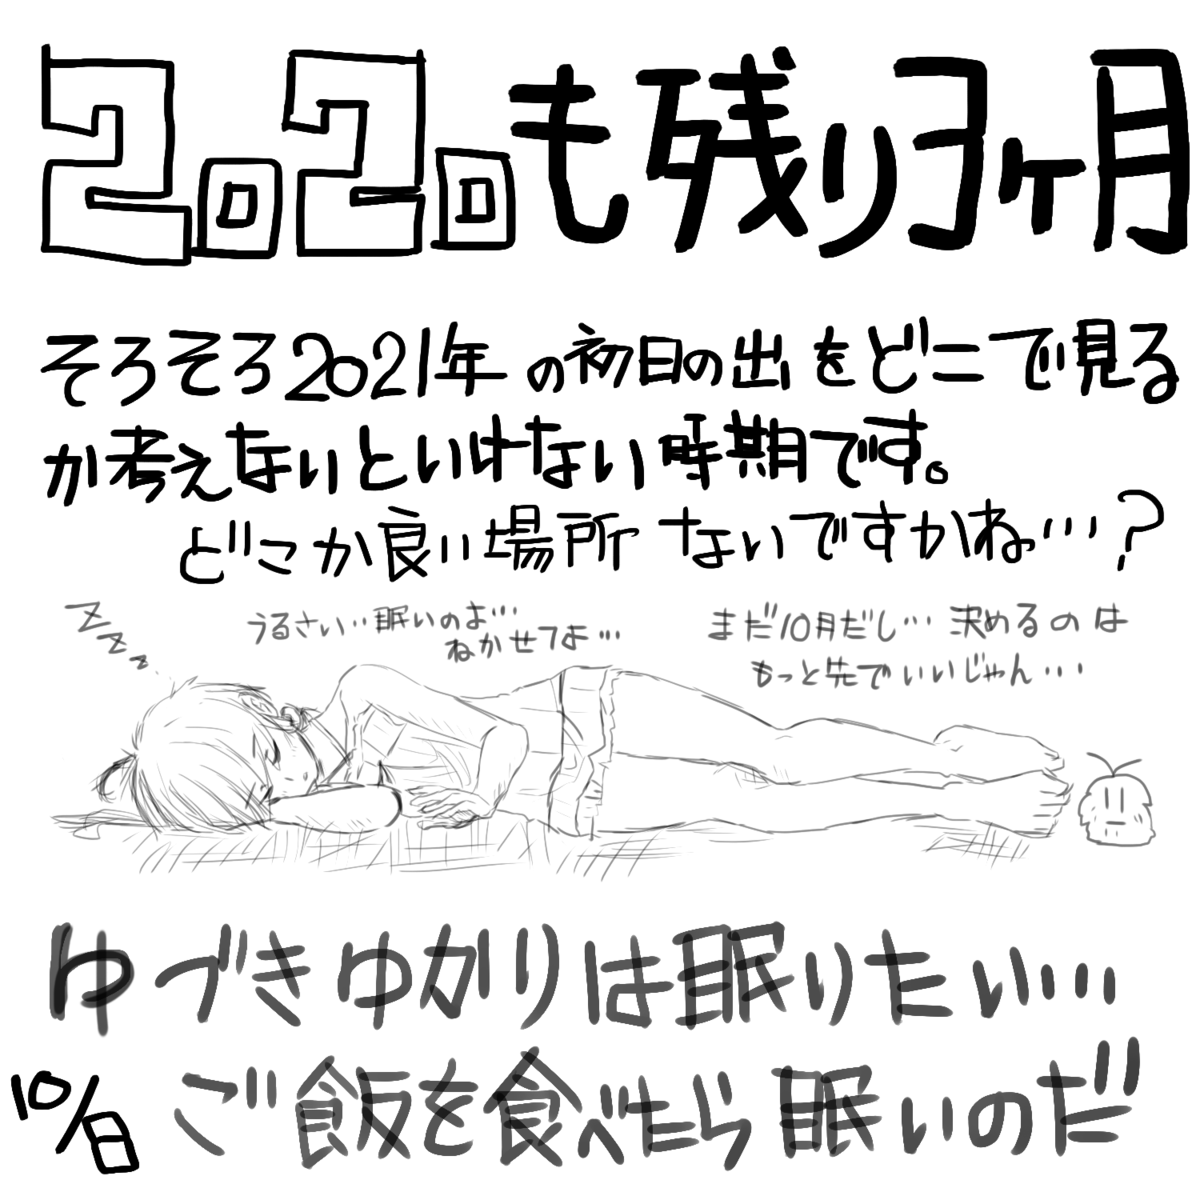 f:id:zomuzomu:20201008151015p:plain